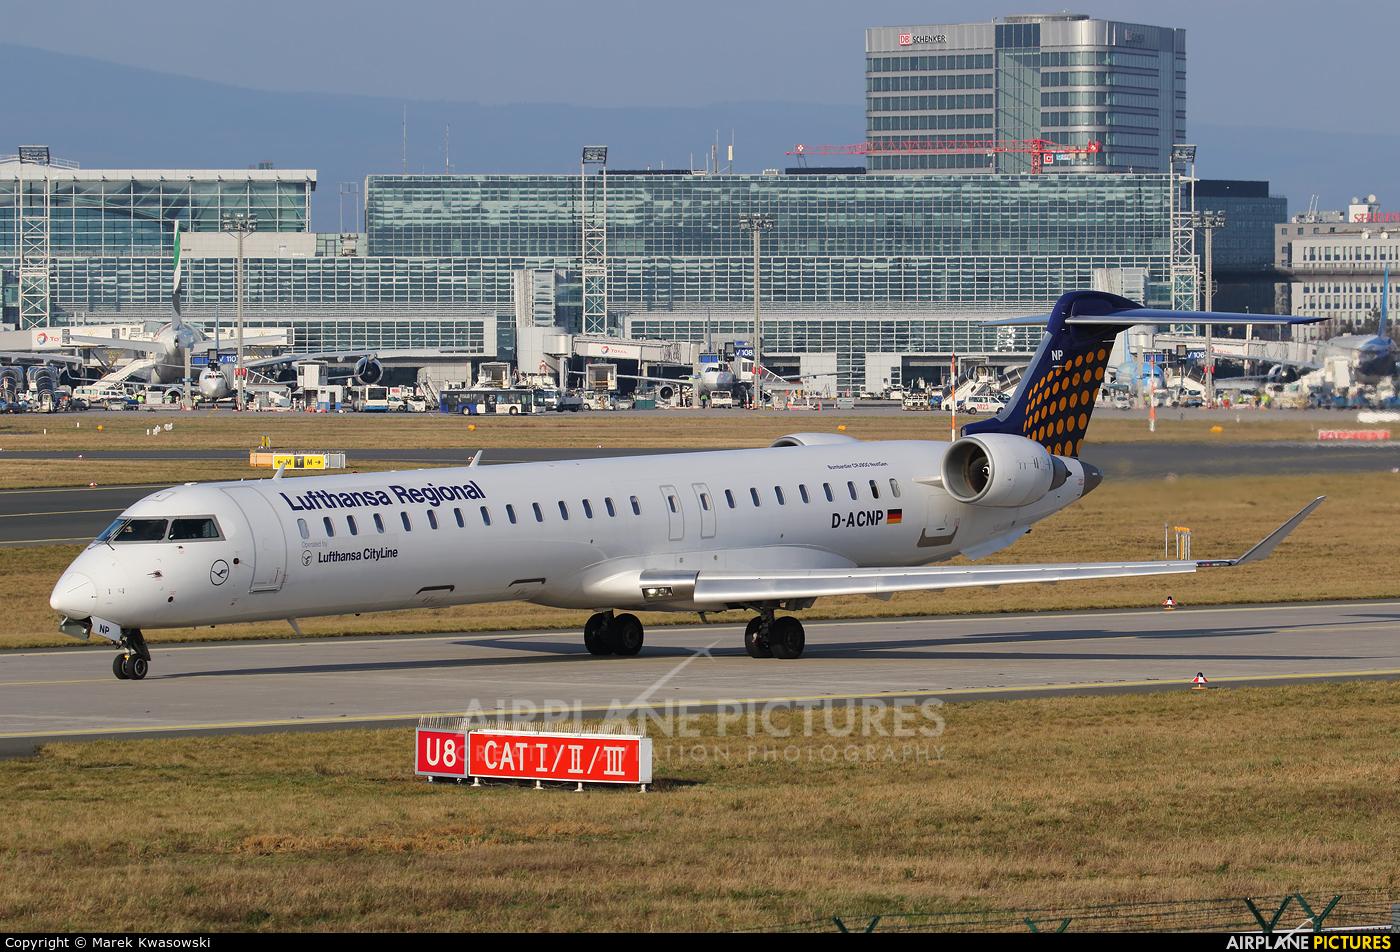 Lufthansa Regional - CityLine D-ACNP aircraft at Frankfurt